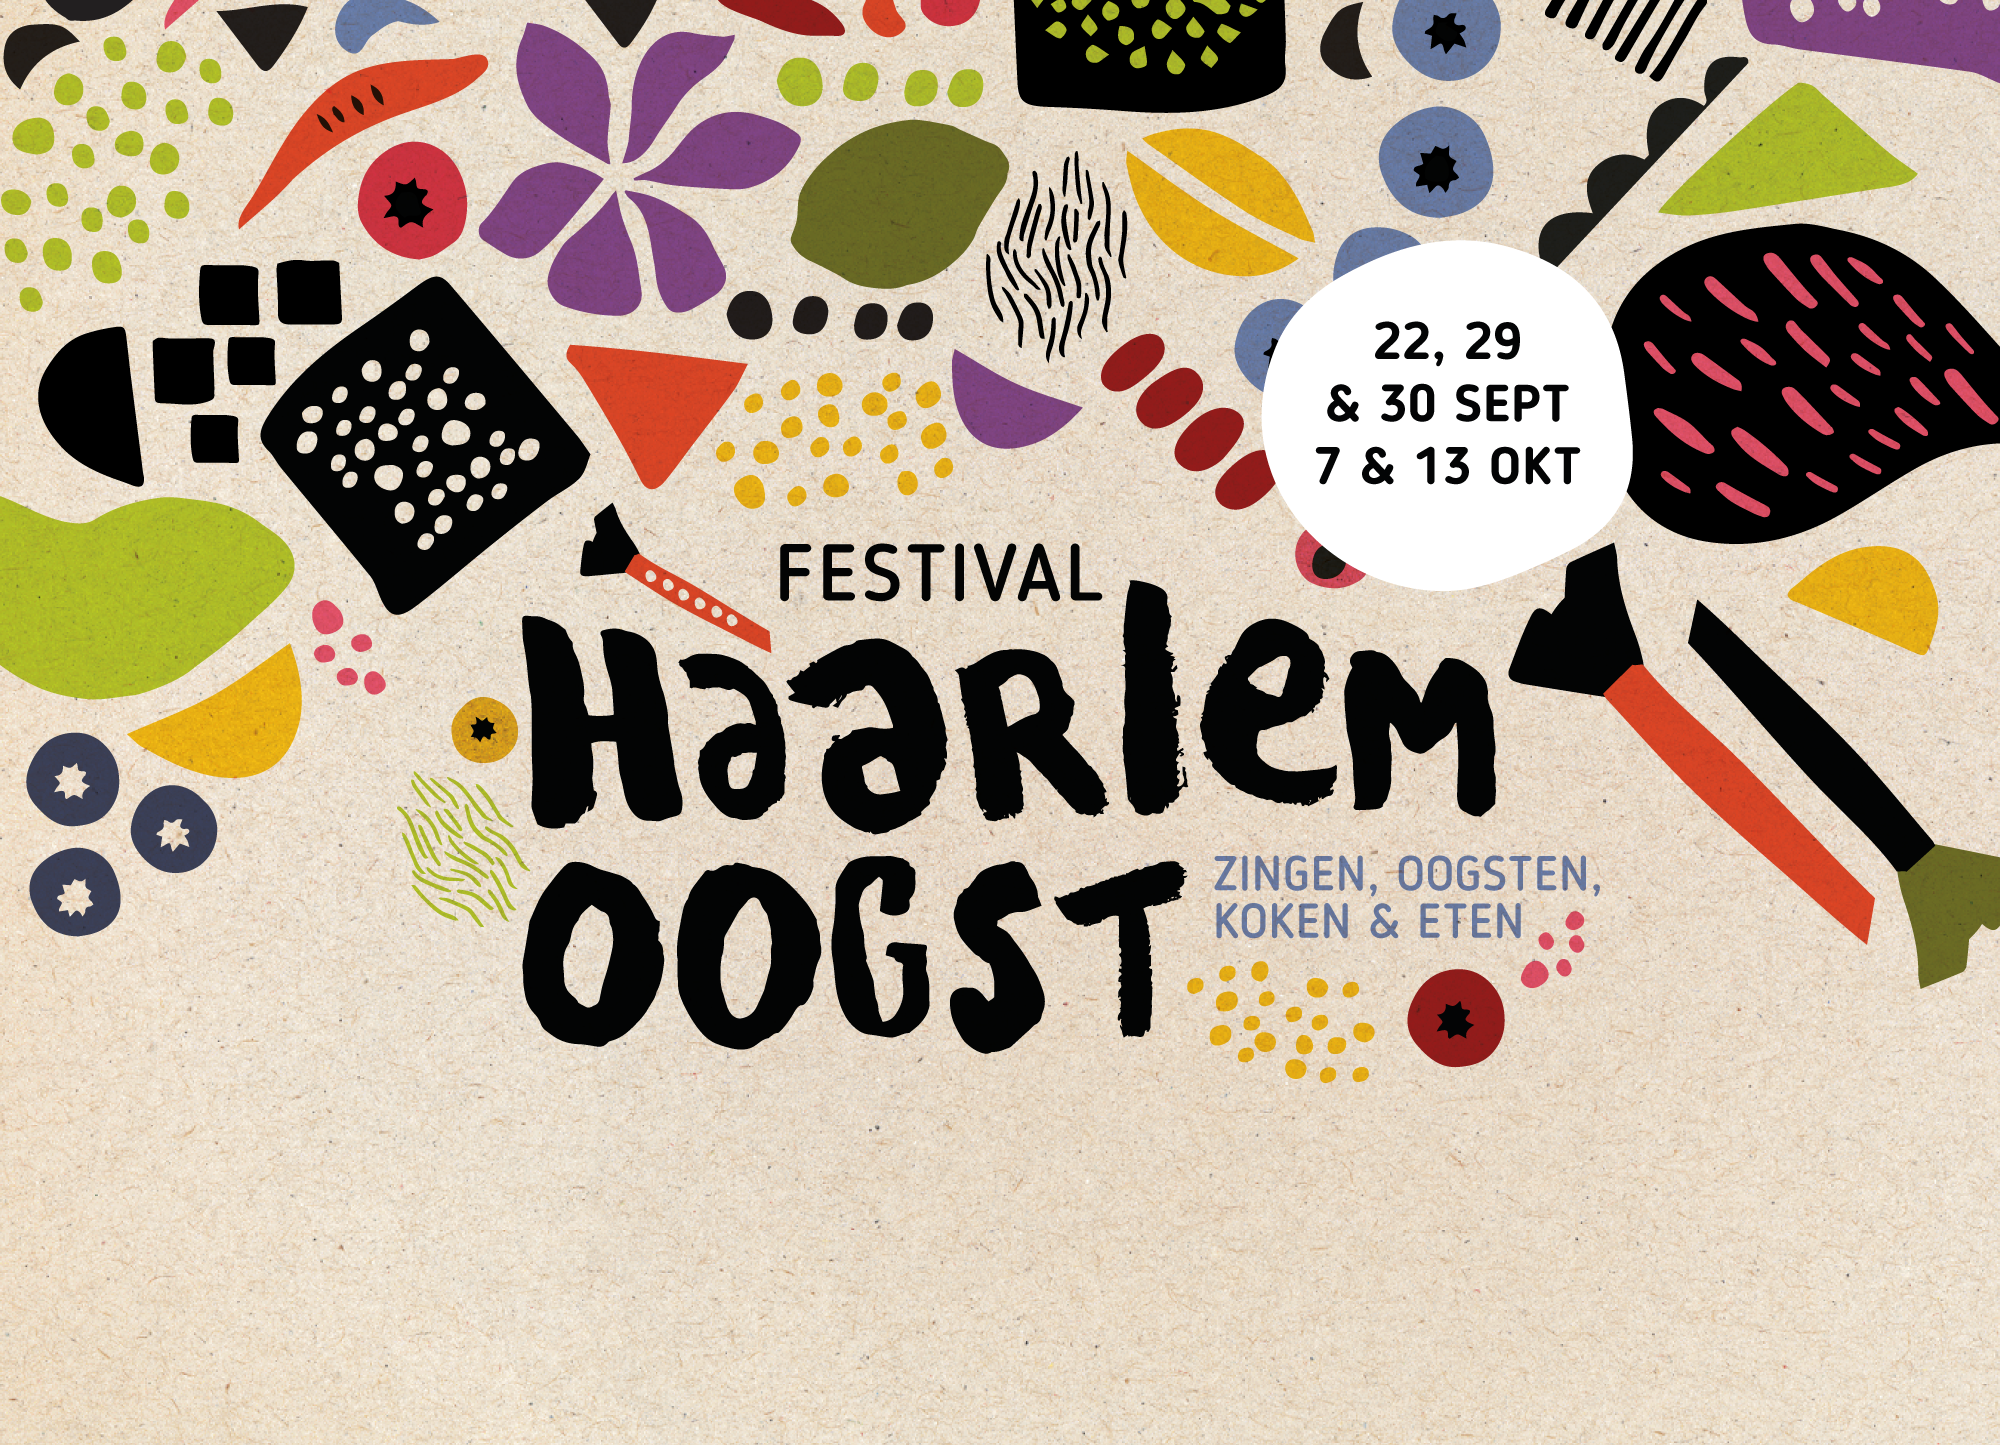 Festival Haarlem Oogst